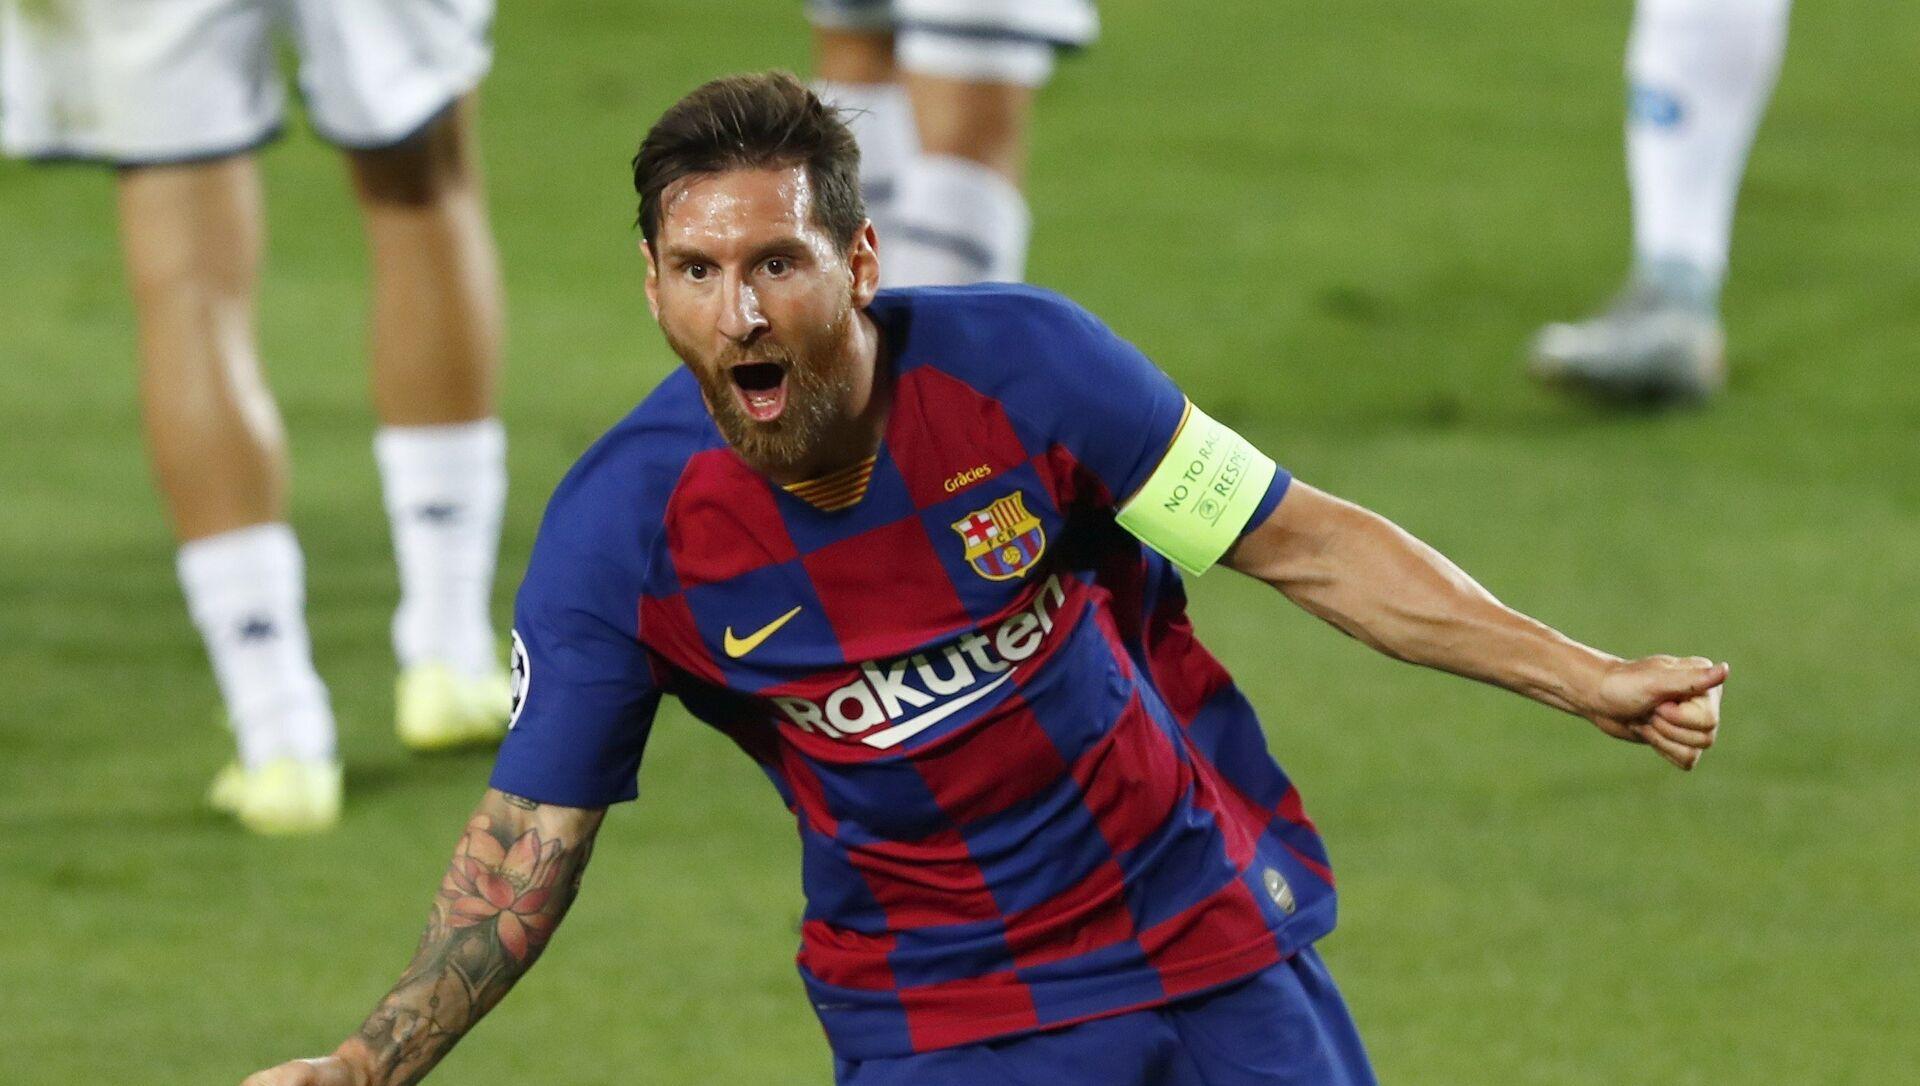 Leo Messi, futbolista argentino - Sputnik Mundo, 1920, 31.01.2021